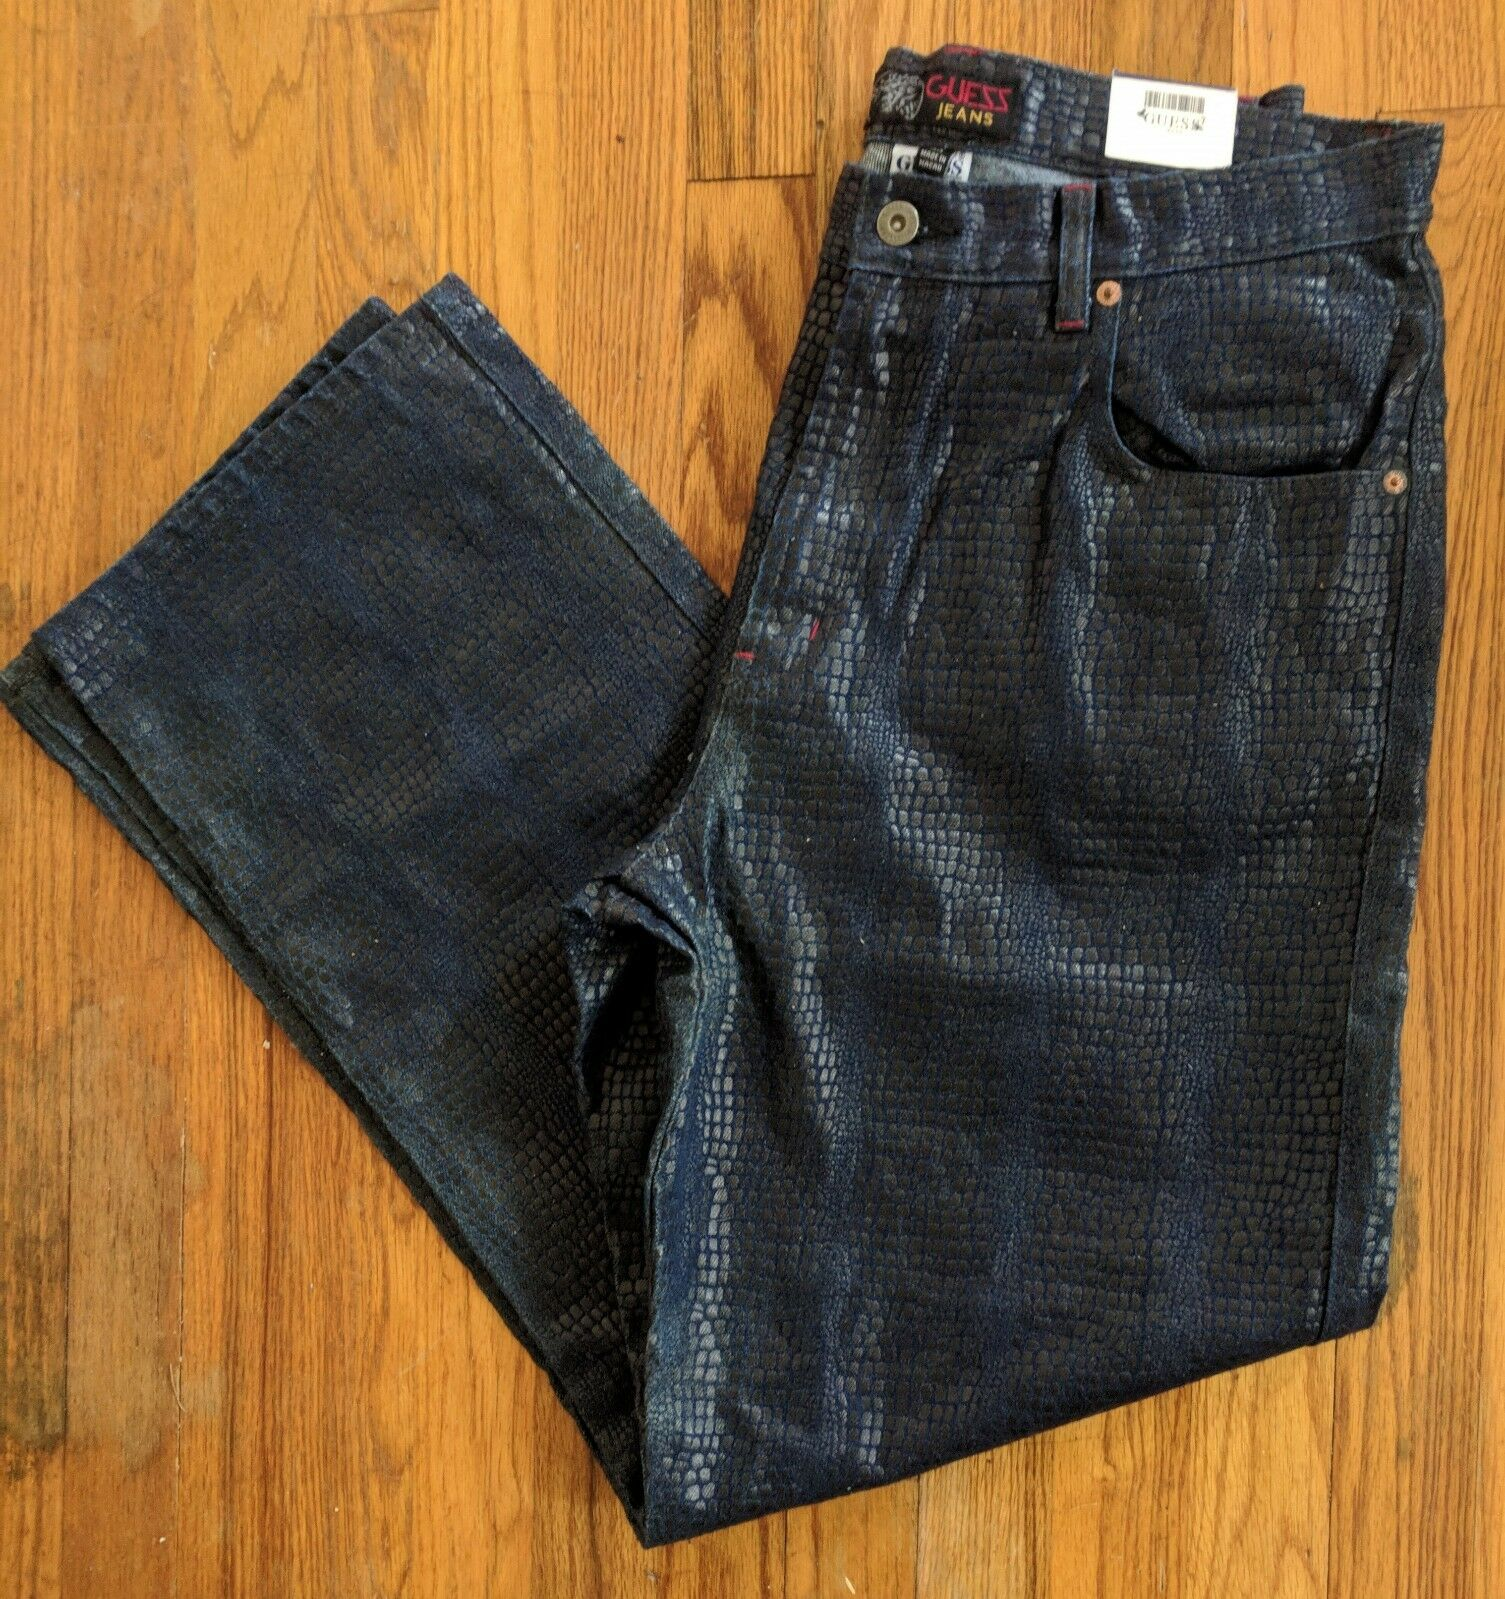 af1db7a1 Vintage Guess Men's Alligator Navy bluee Jeans Pants RARE Classic x 32  Print 33 napitv679-Jeans